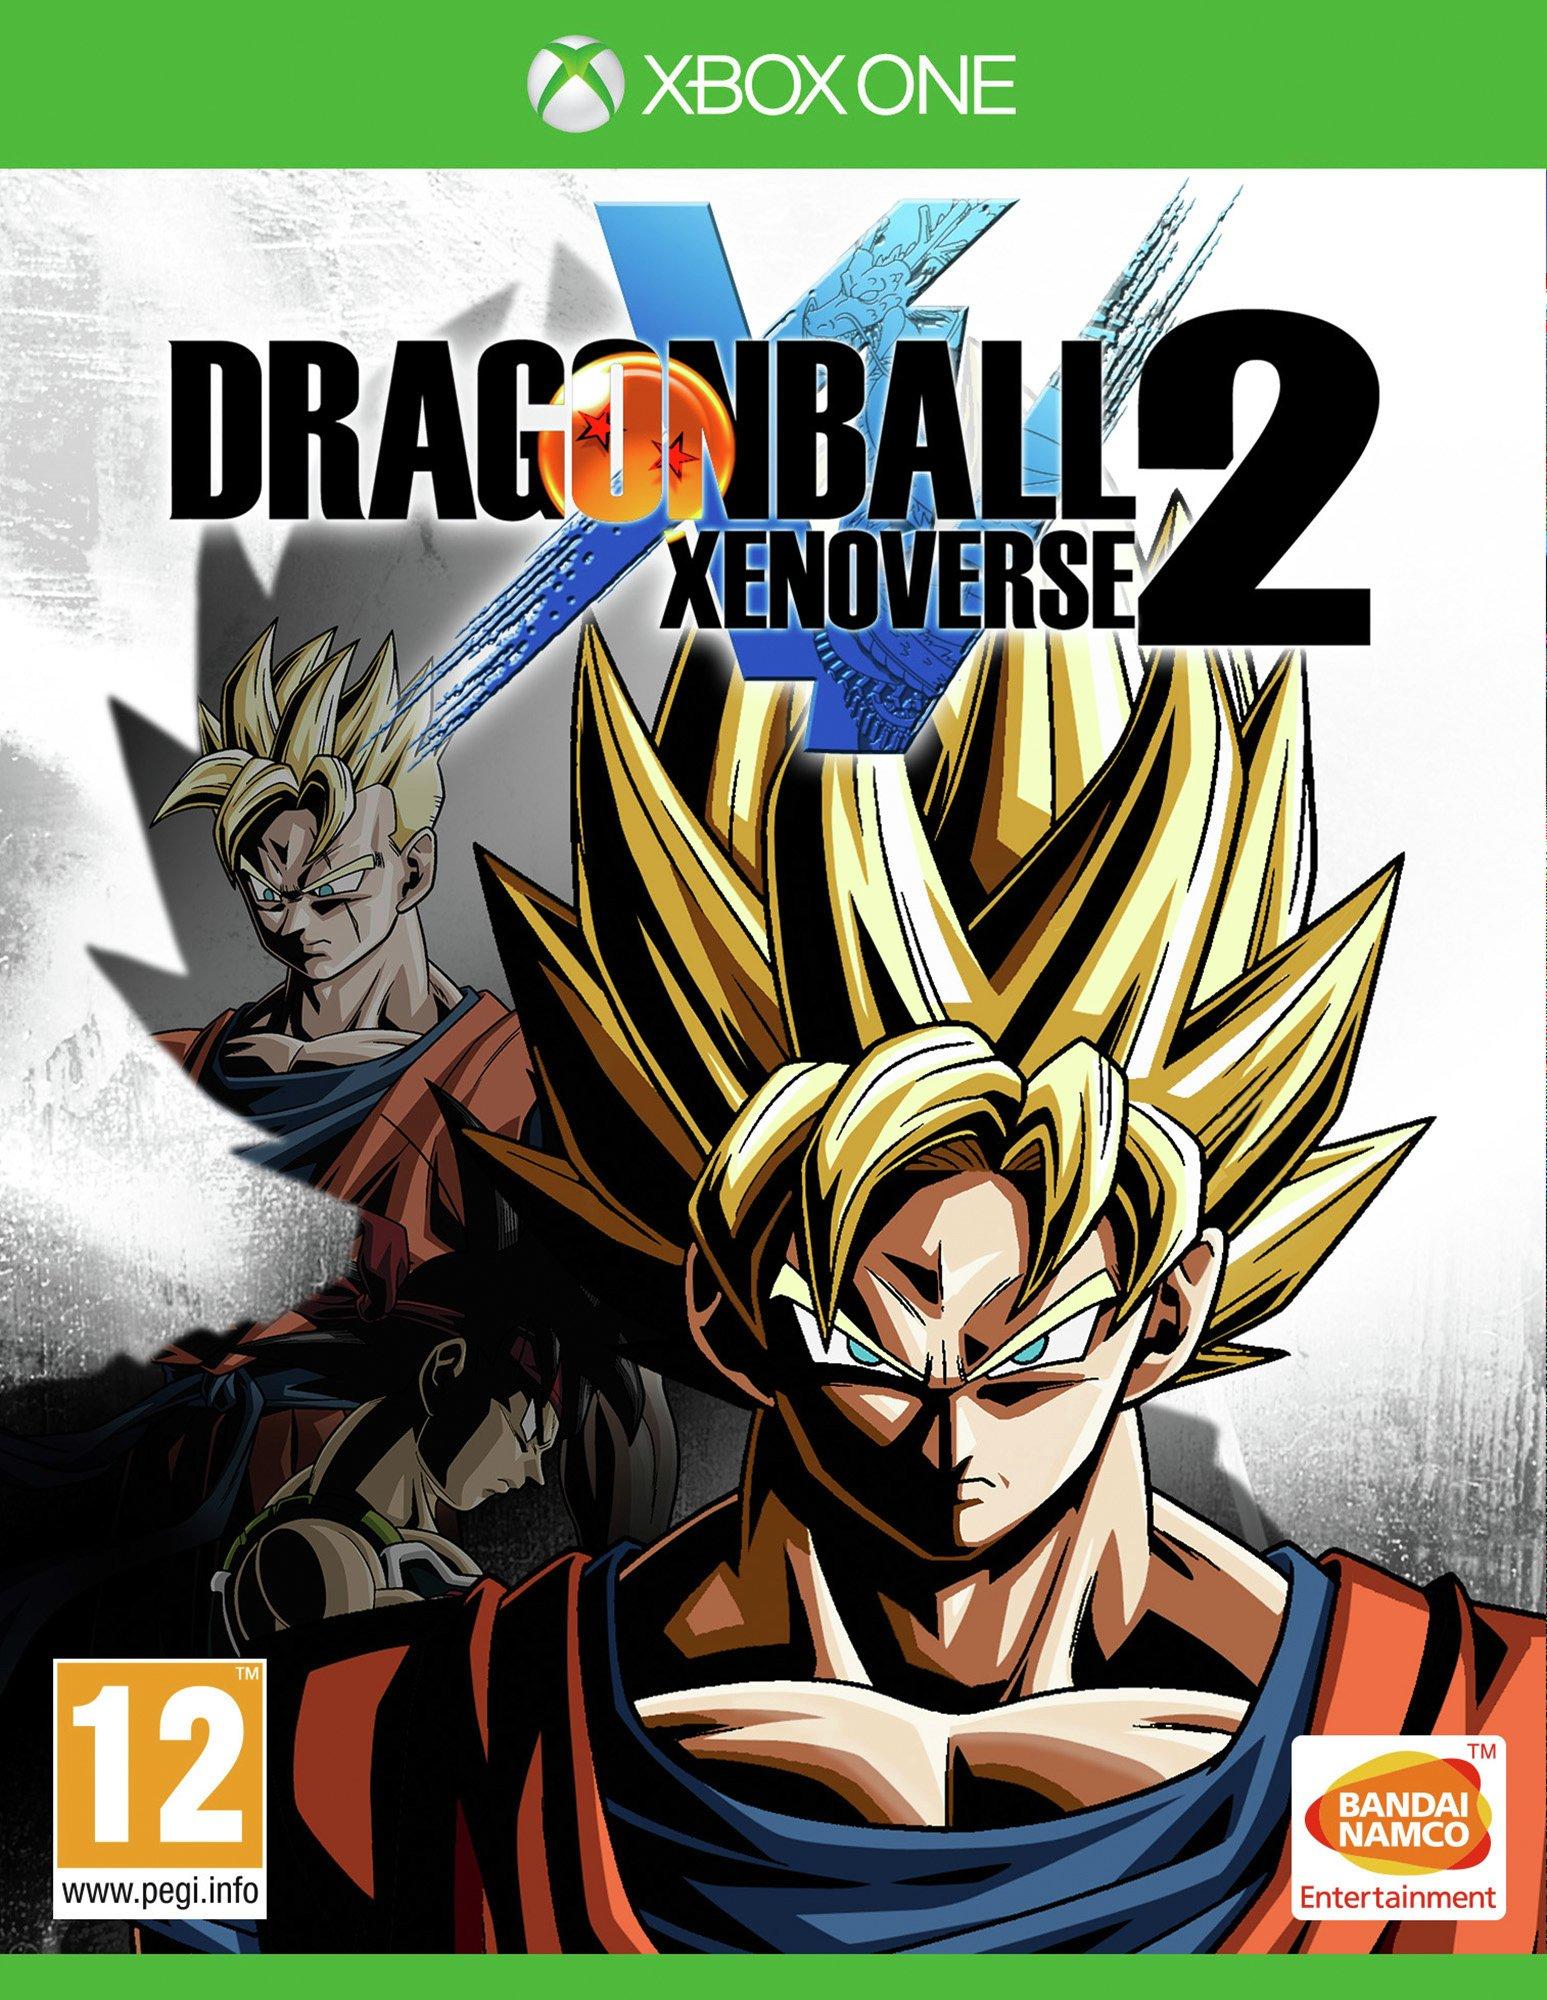 Bandai Namco Dragonball Xenoverse 2 Xbox One Game.